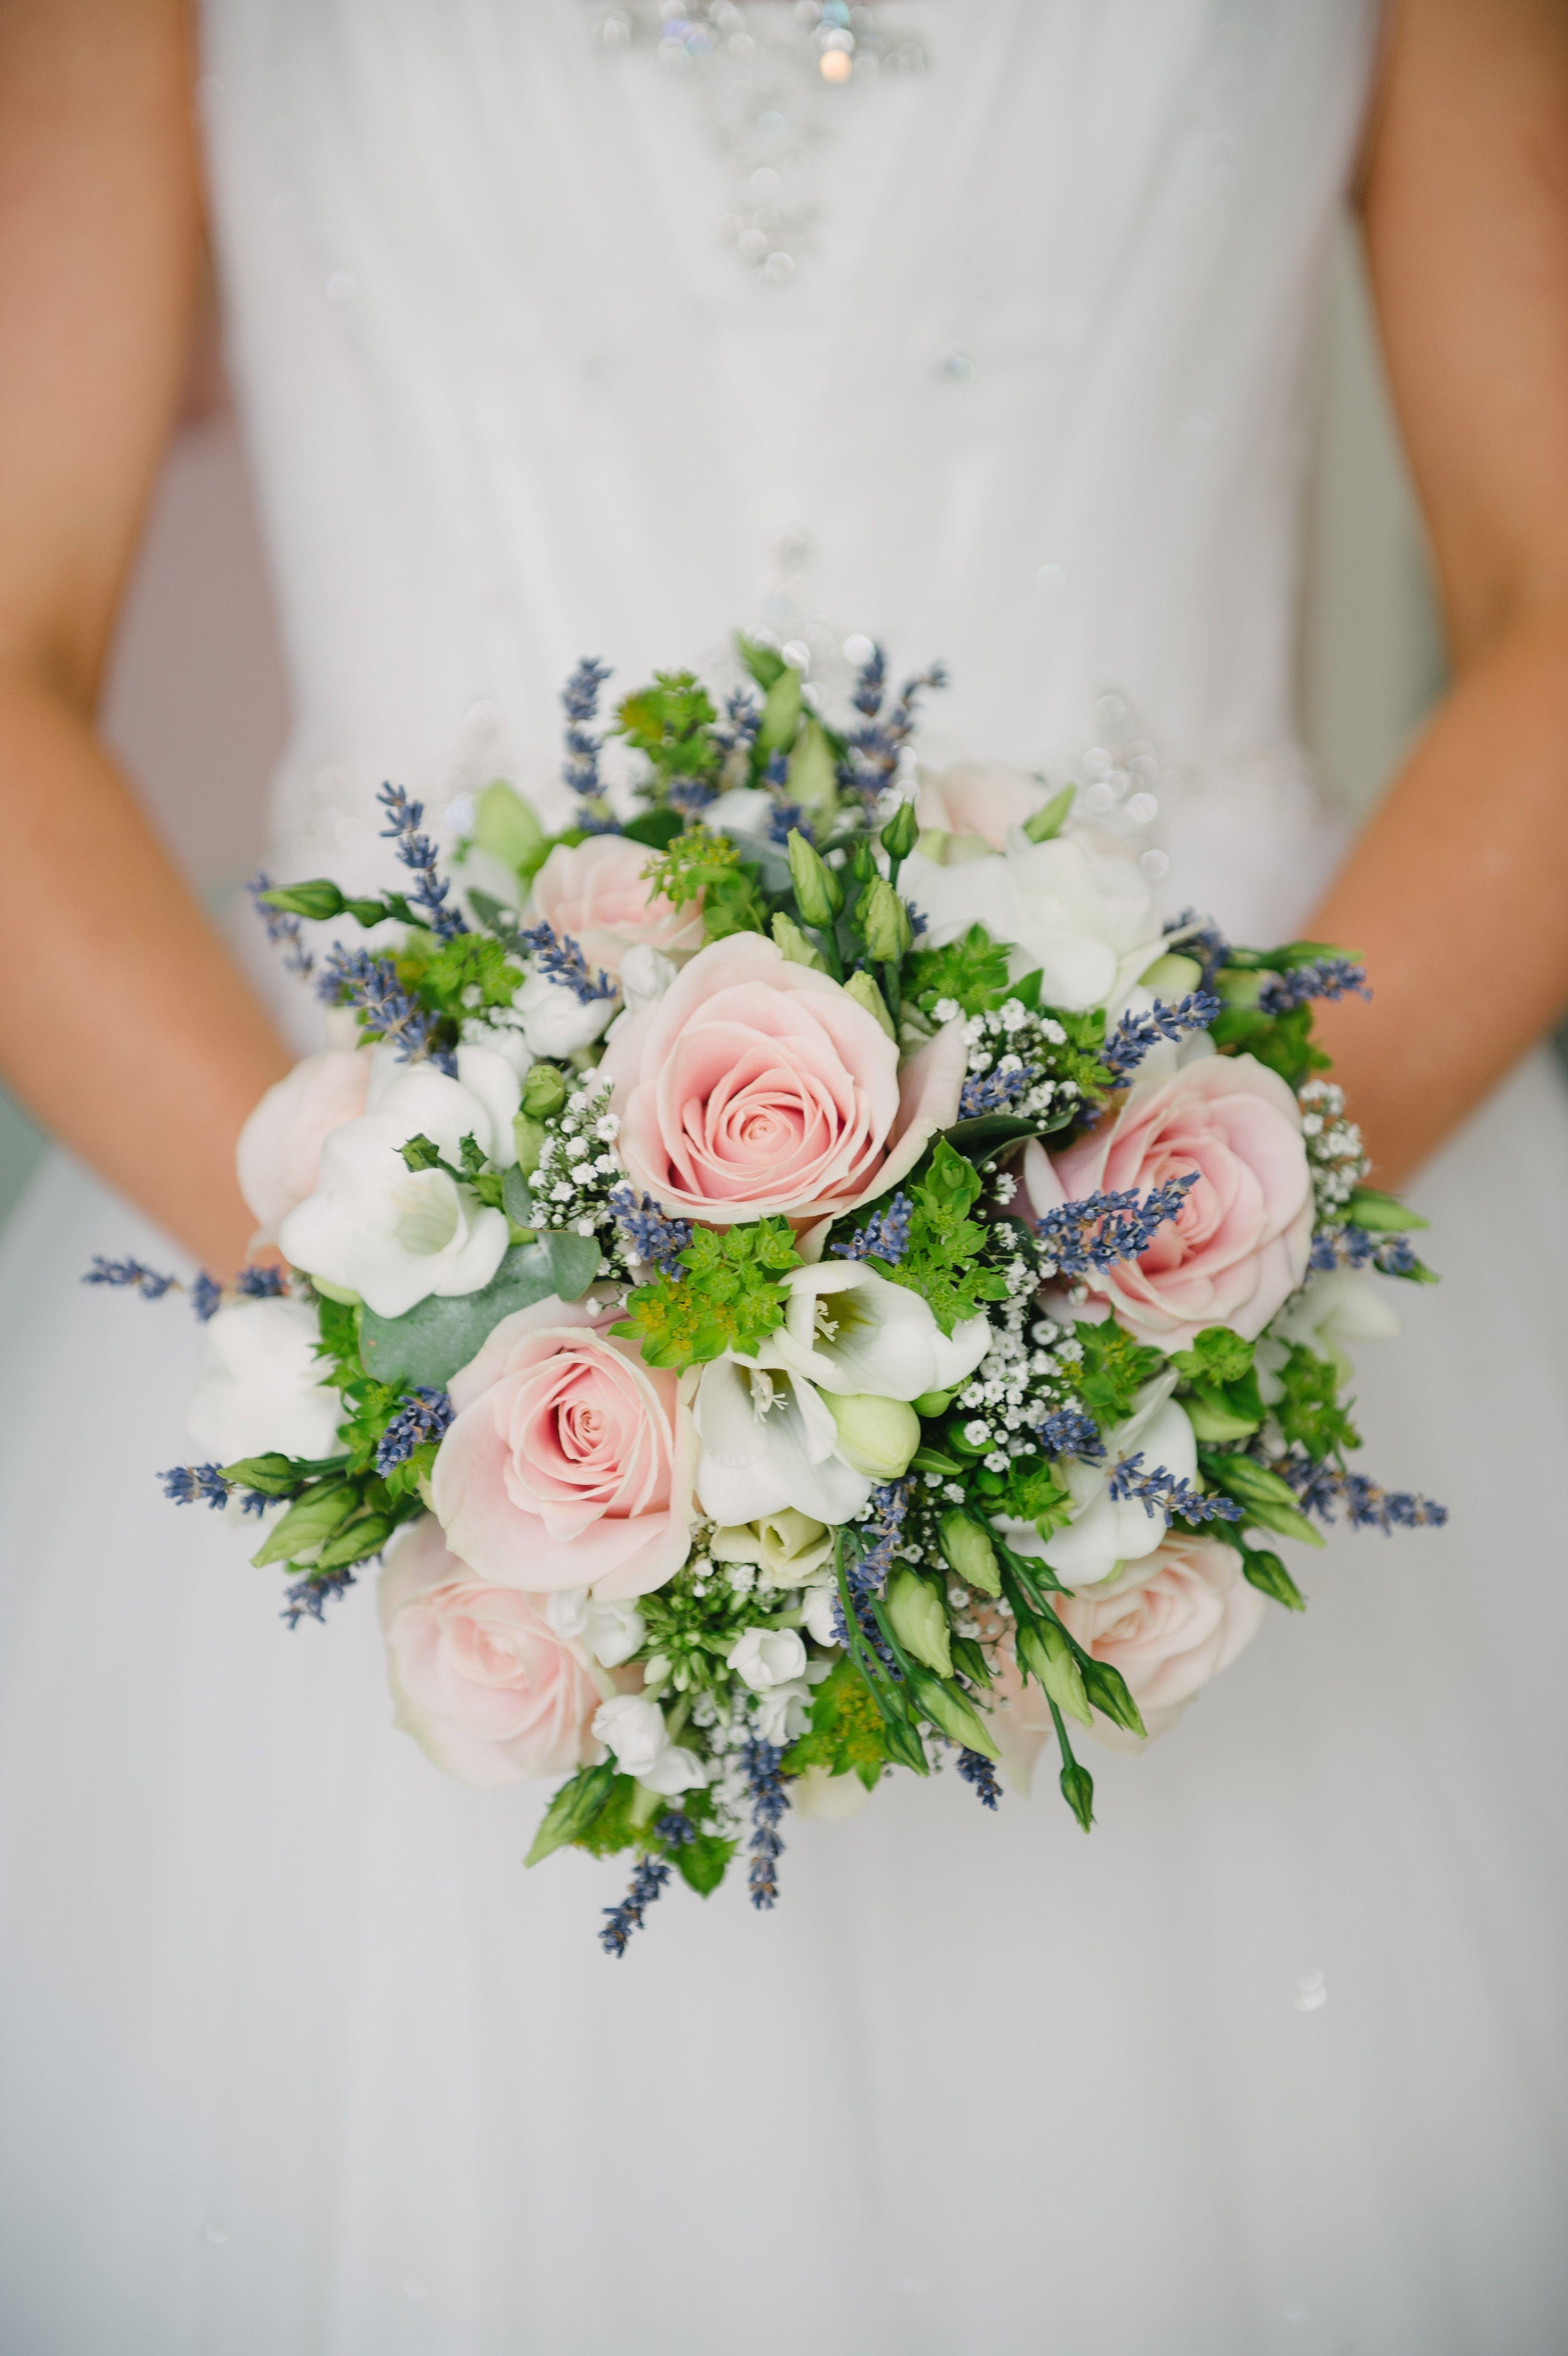 Bridal bouquet #vintage #pinks #heather #pinkbridalbouquets Bridal bouquet #vintage #pinks #heather #pinkbridalbouquets Bridal bouquet #vintage #pinks #heather #pinkbridalbouquets Bridal bouquet #vintage #pinks #heather